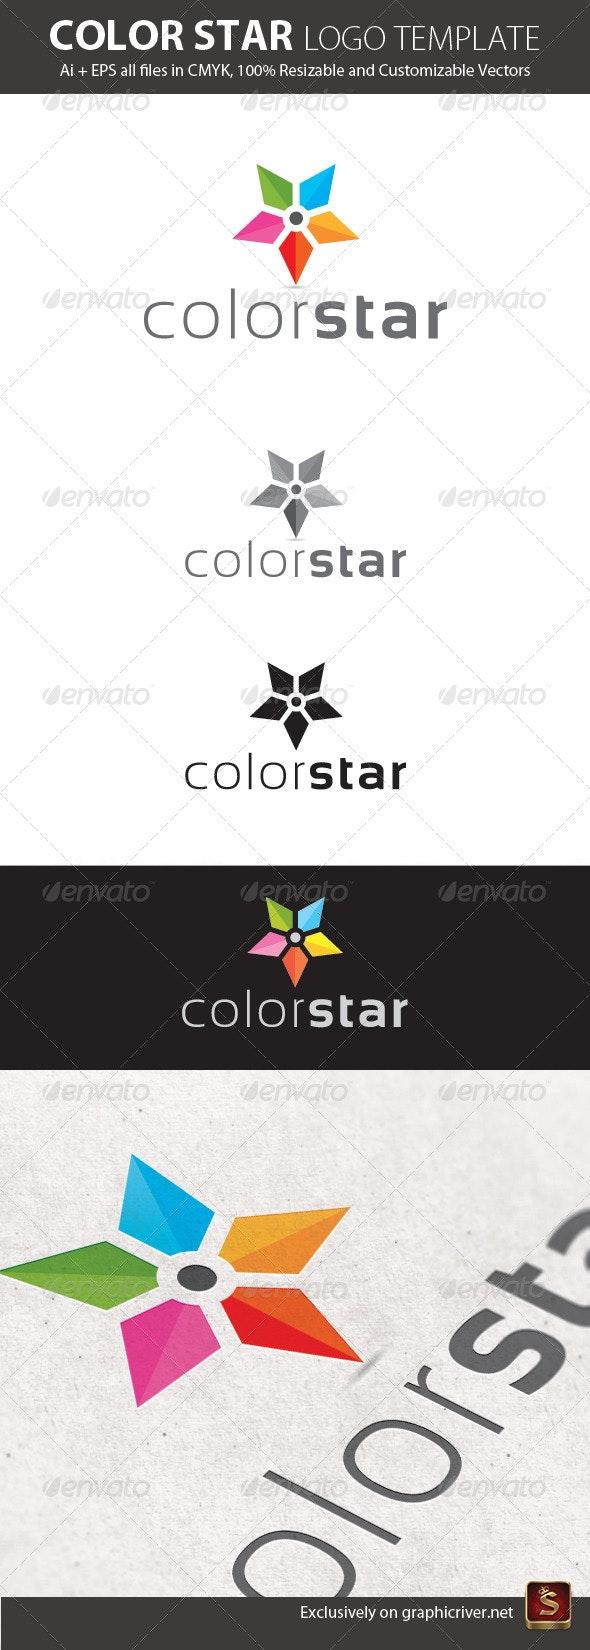 Color Star Logo Template - Vector Abstract